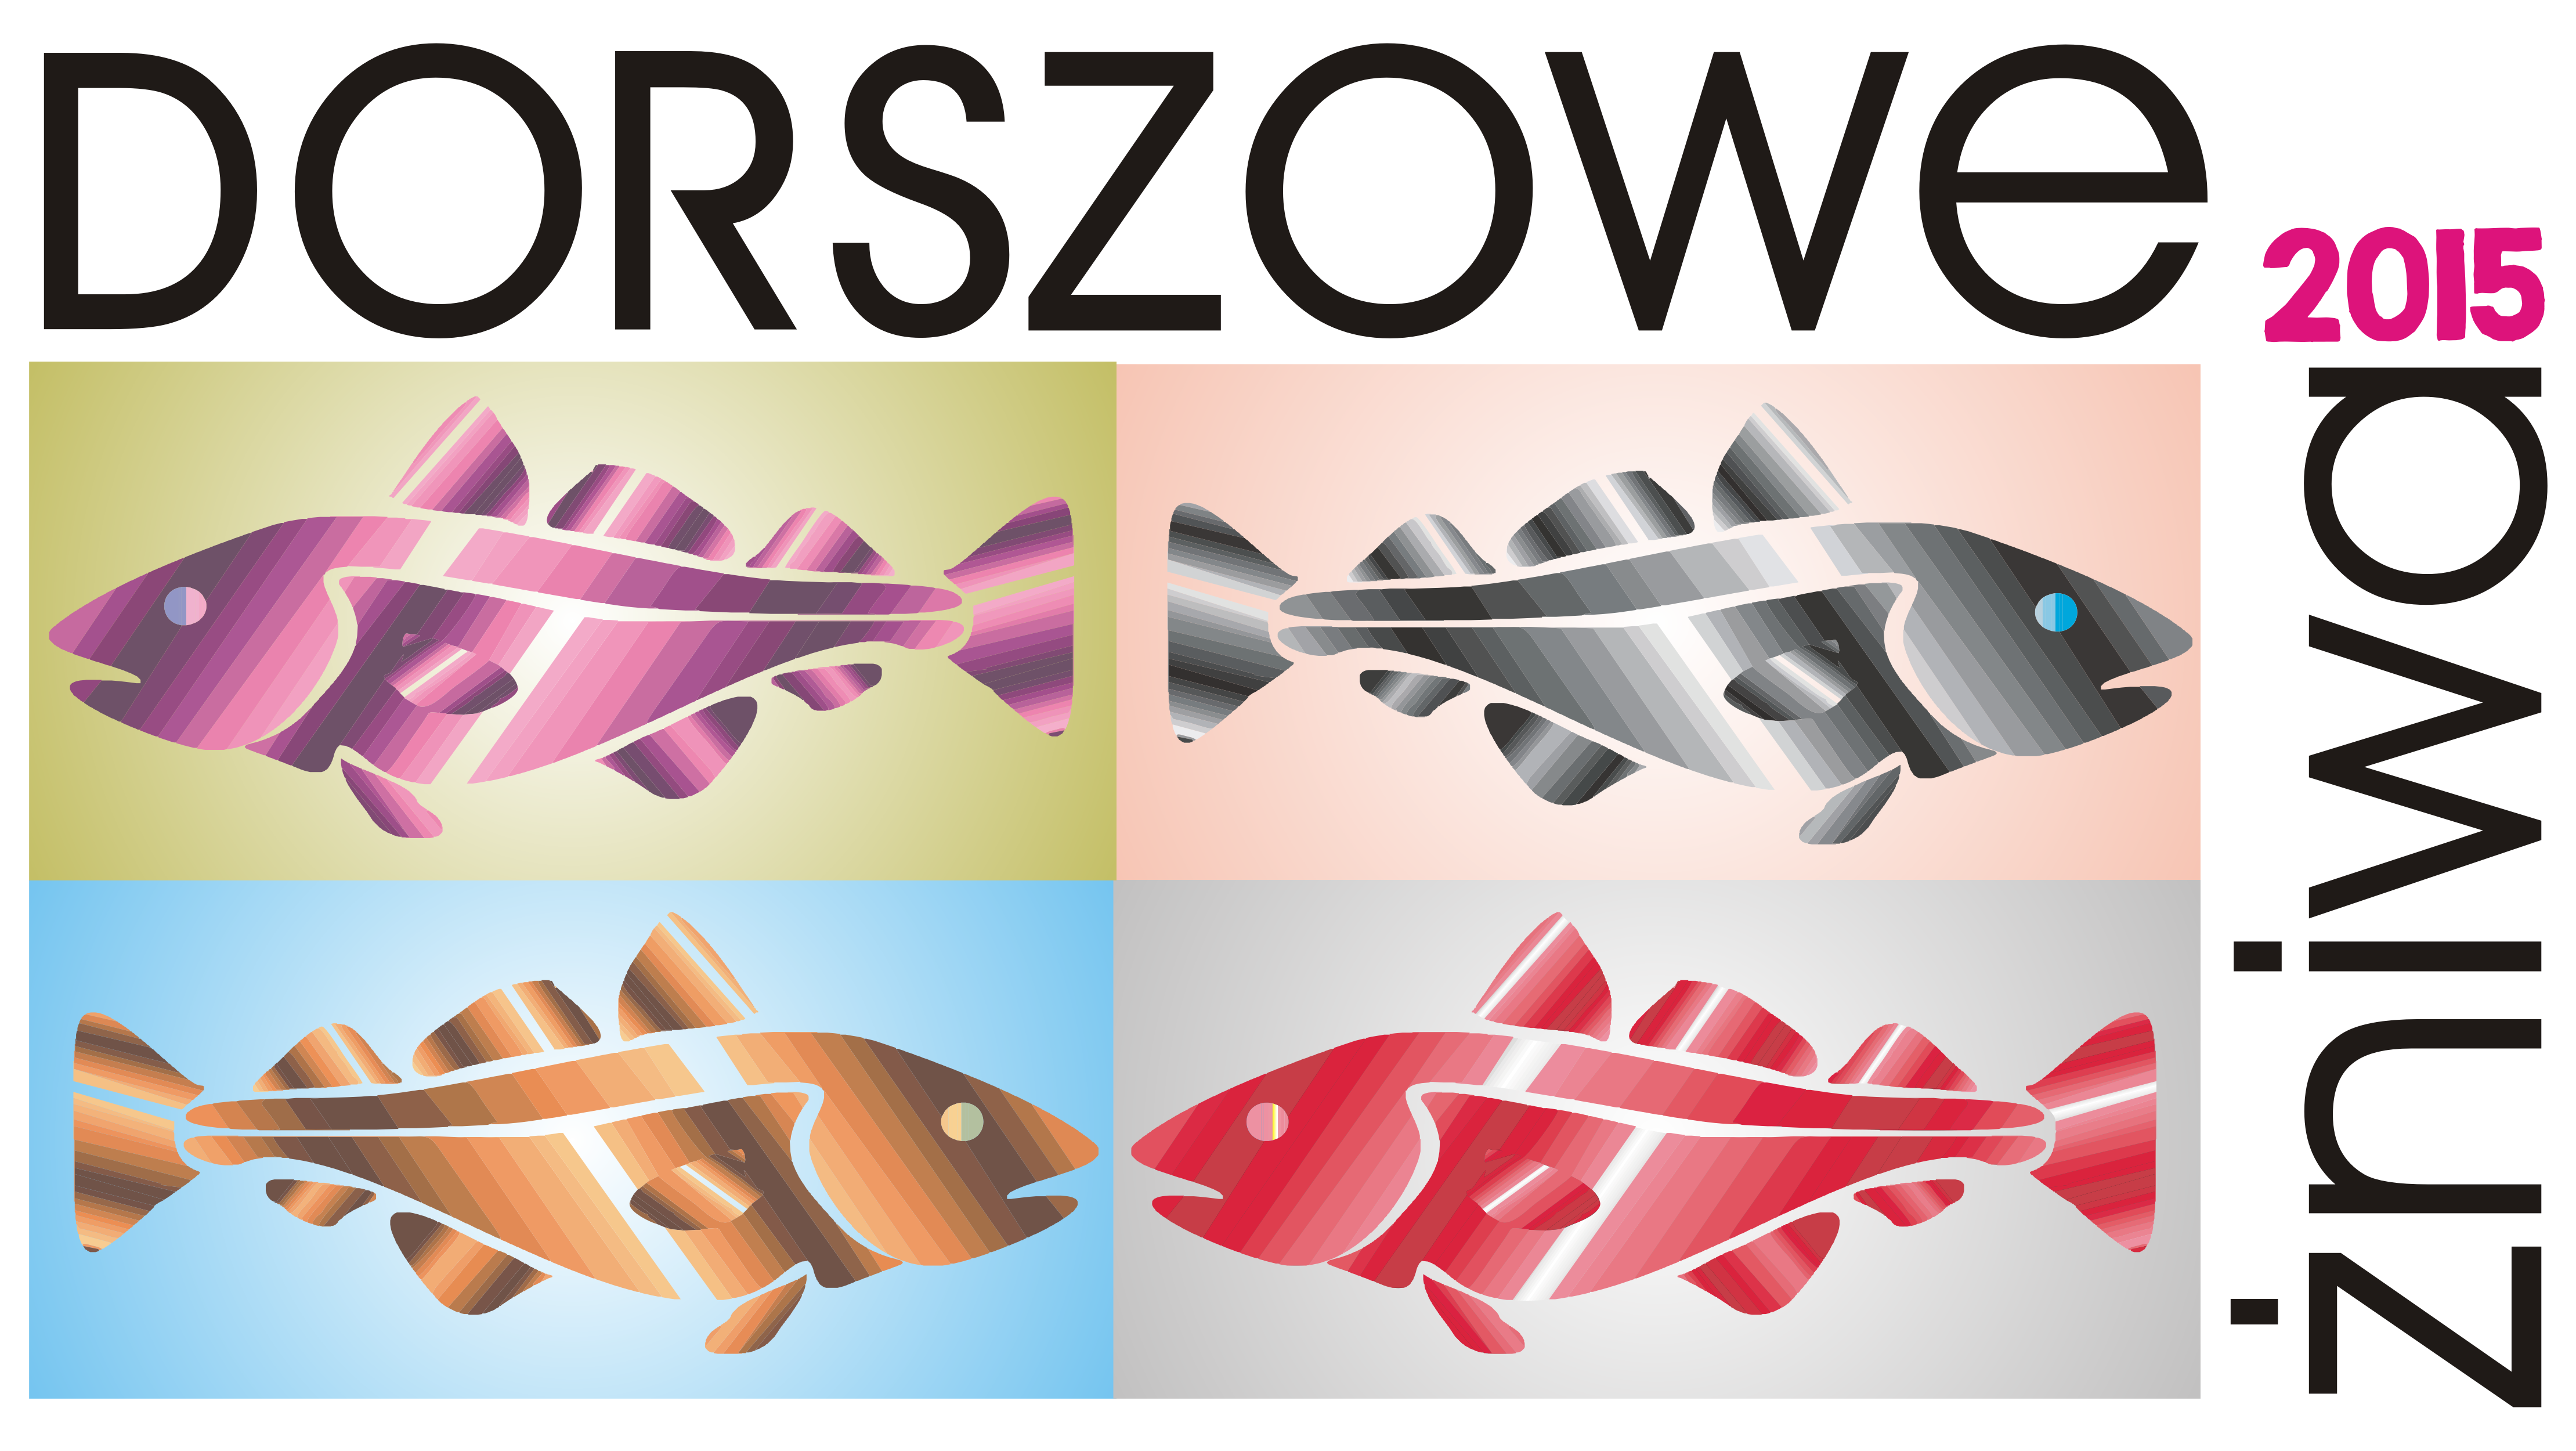 dorszowe żniwa 2015 logo